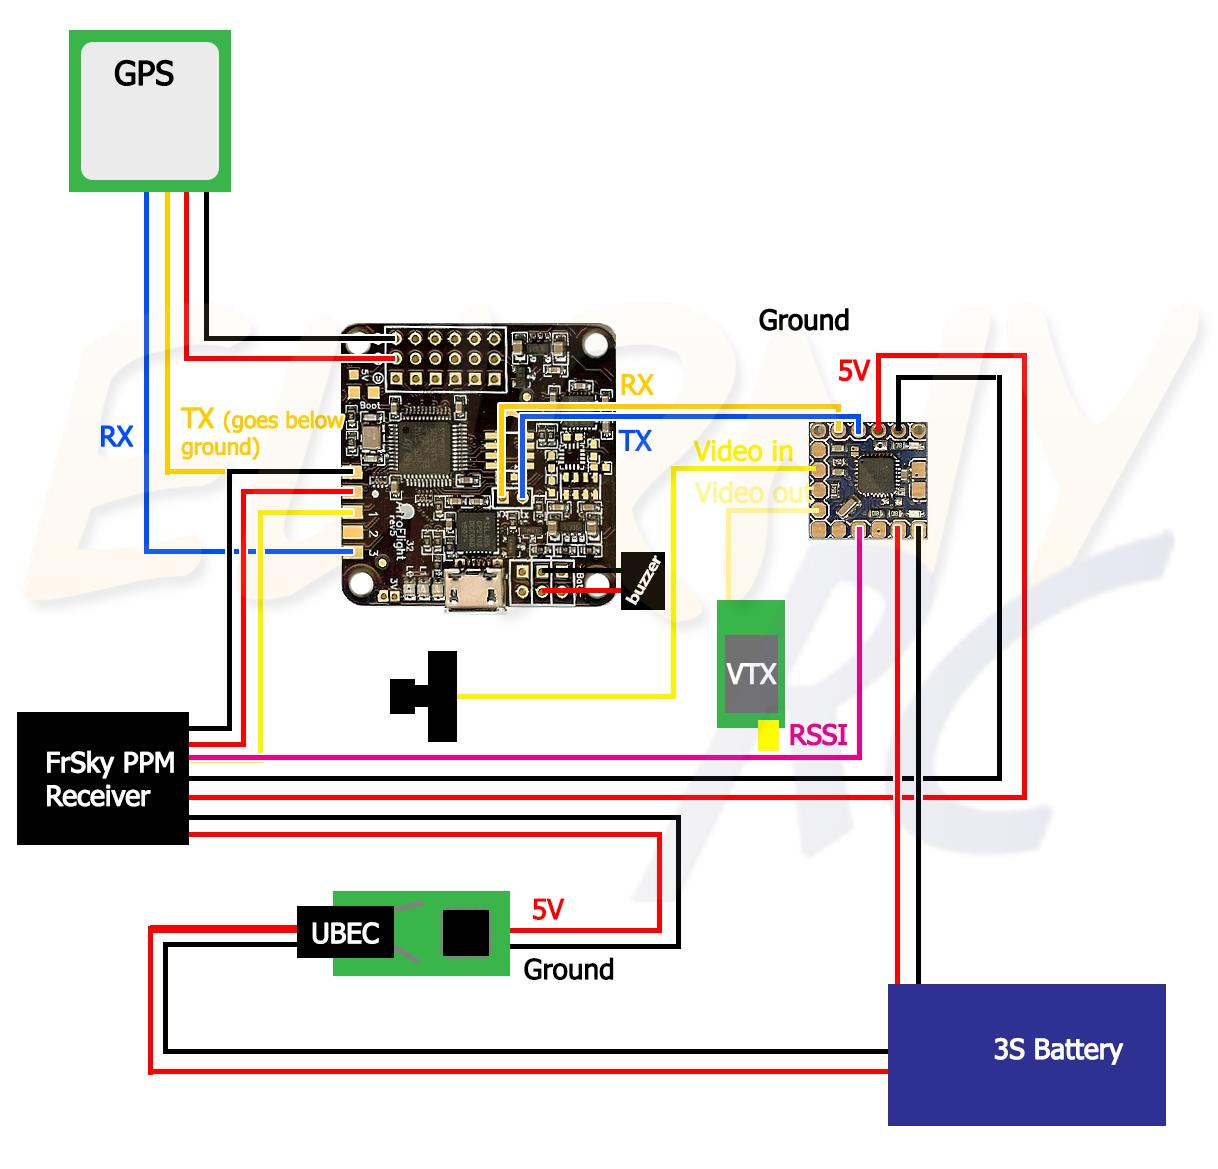 Naze32 Gps Minimosd Diagram